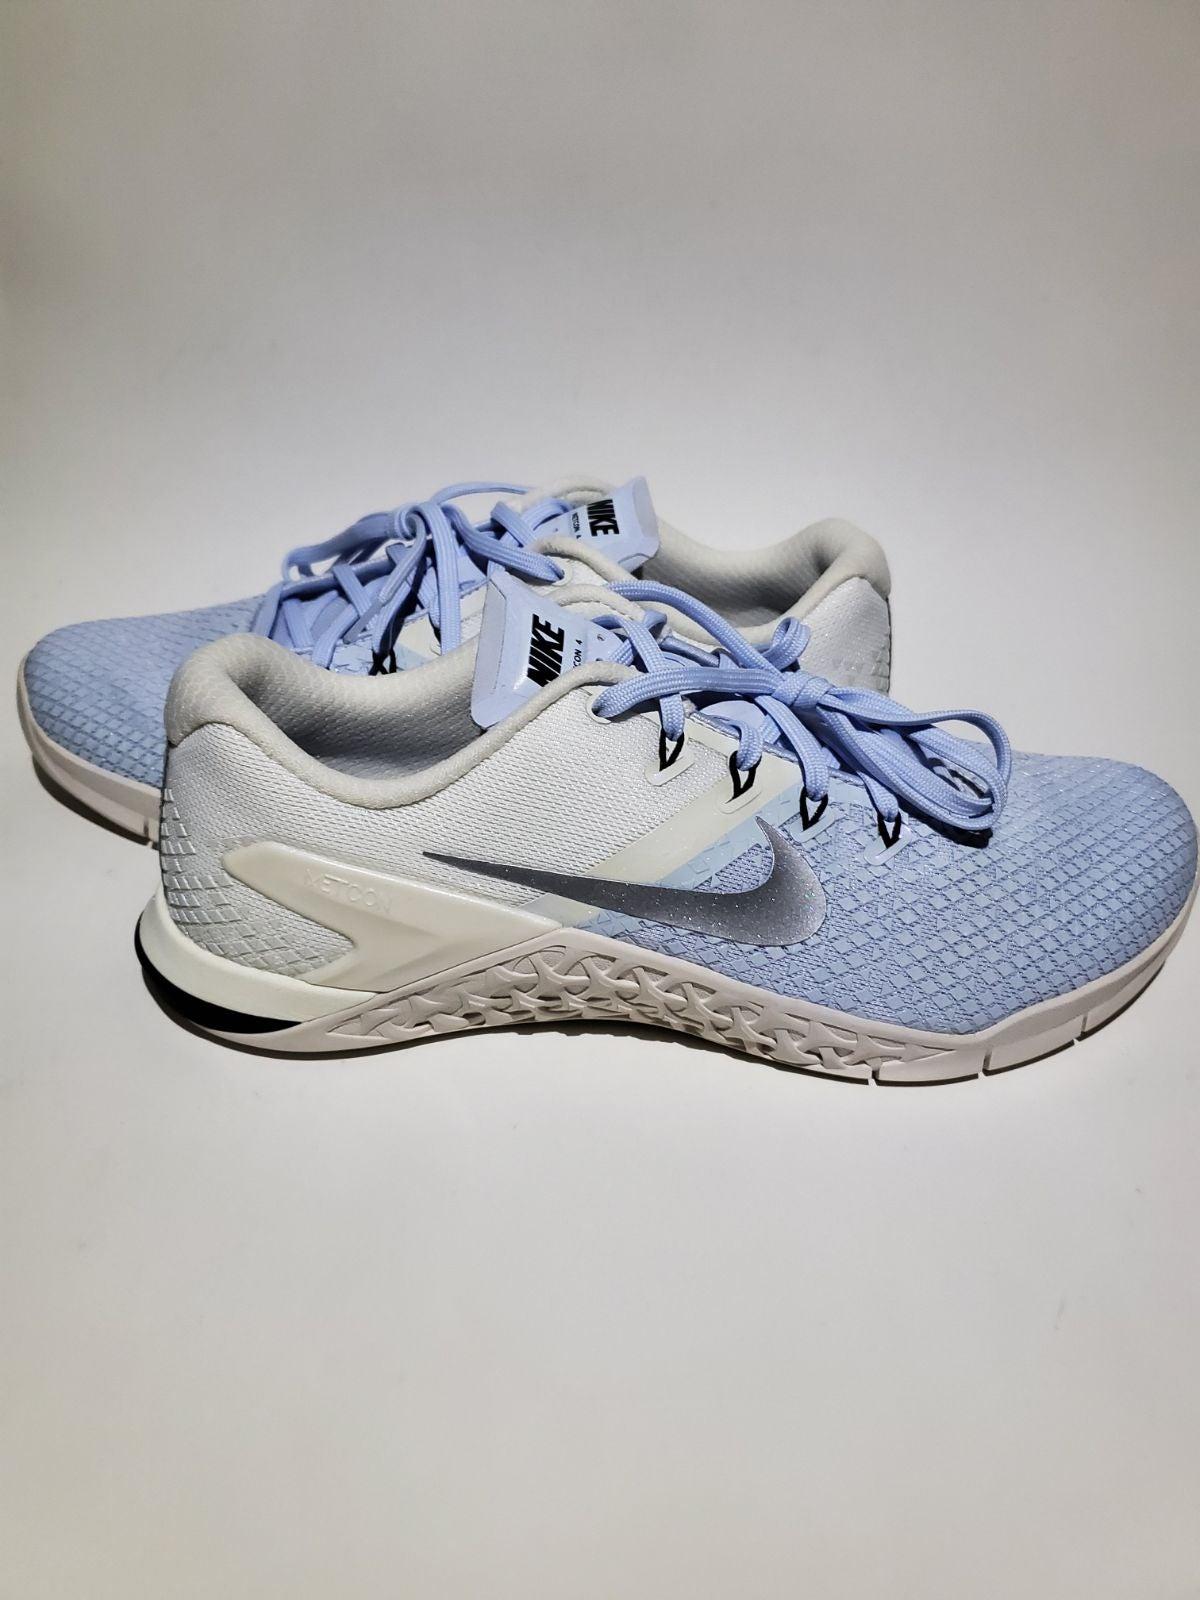 Nike Metcon 4 XD Metallic Training 11